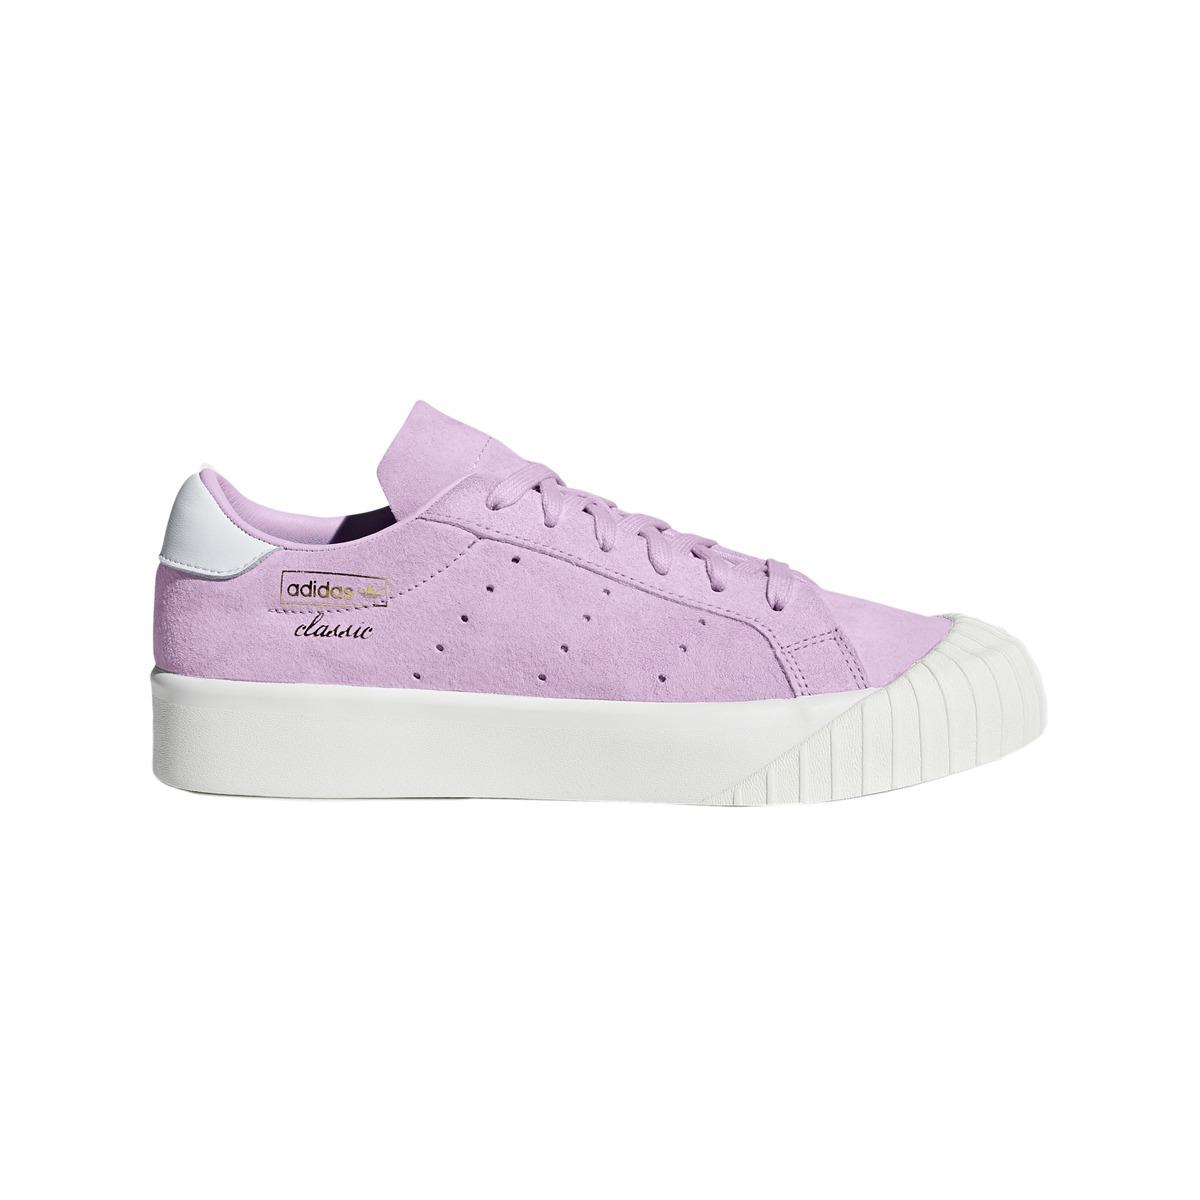 low priced a4a58 840ce Zapatillas adidas Originals Moda Everyn W Mujer Li bl -   3.999,00 ...